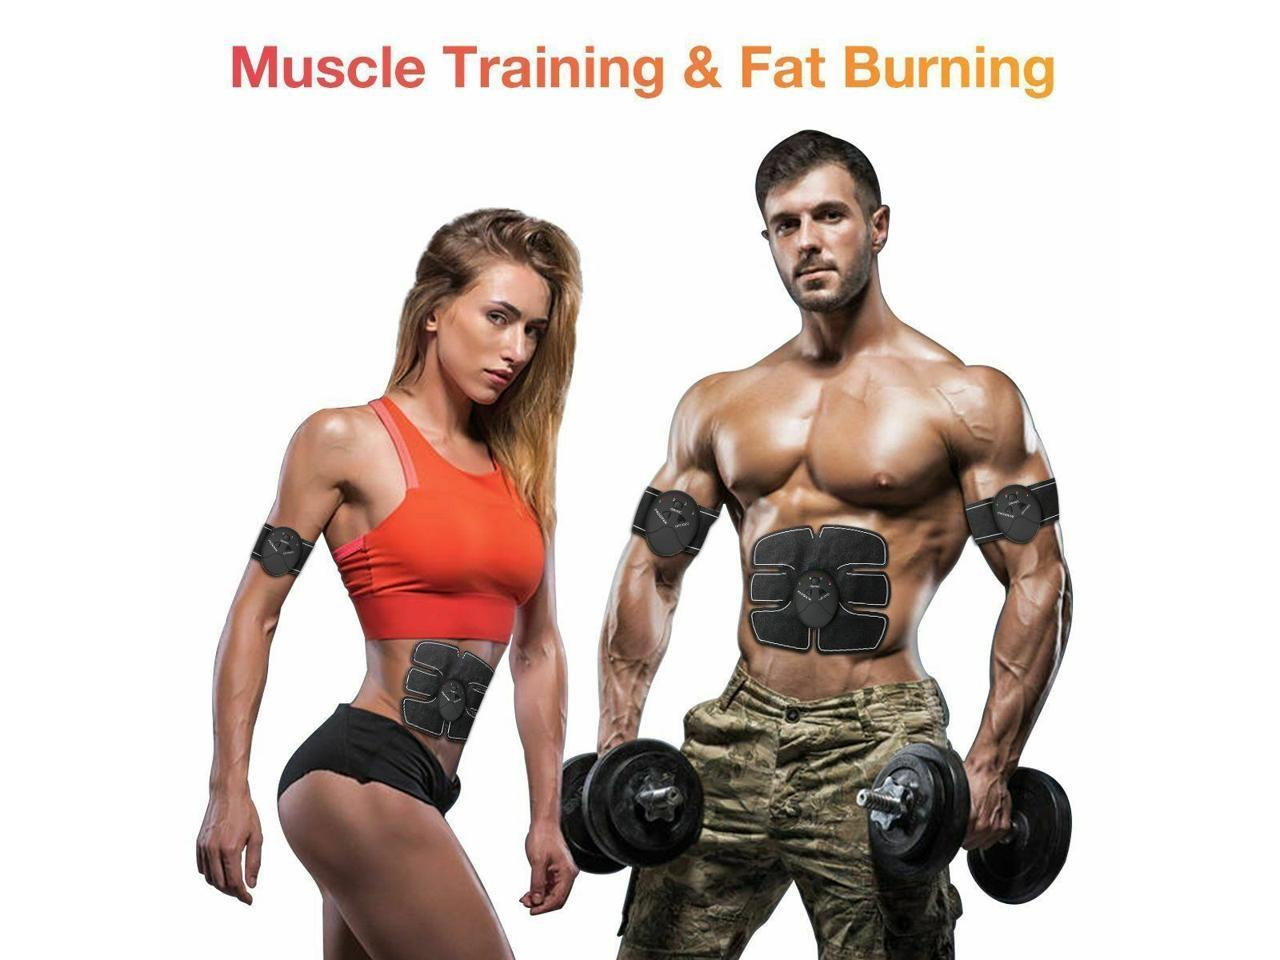 Electric Muscle Toner Machine Wireless Toning Belt Simulation ABS Fat Burner Kit